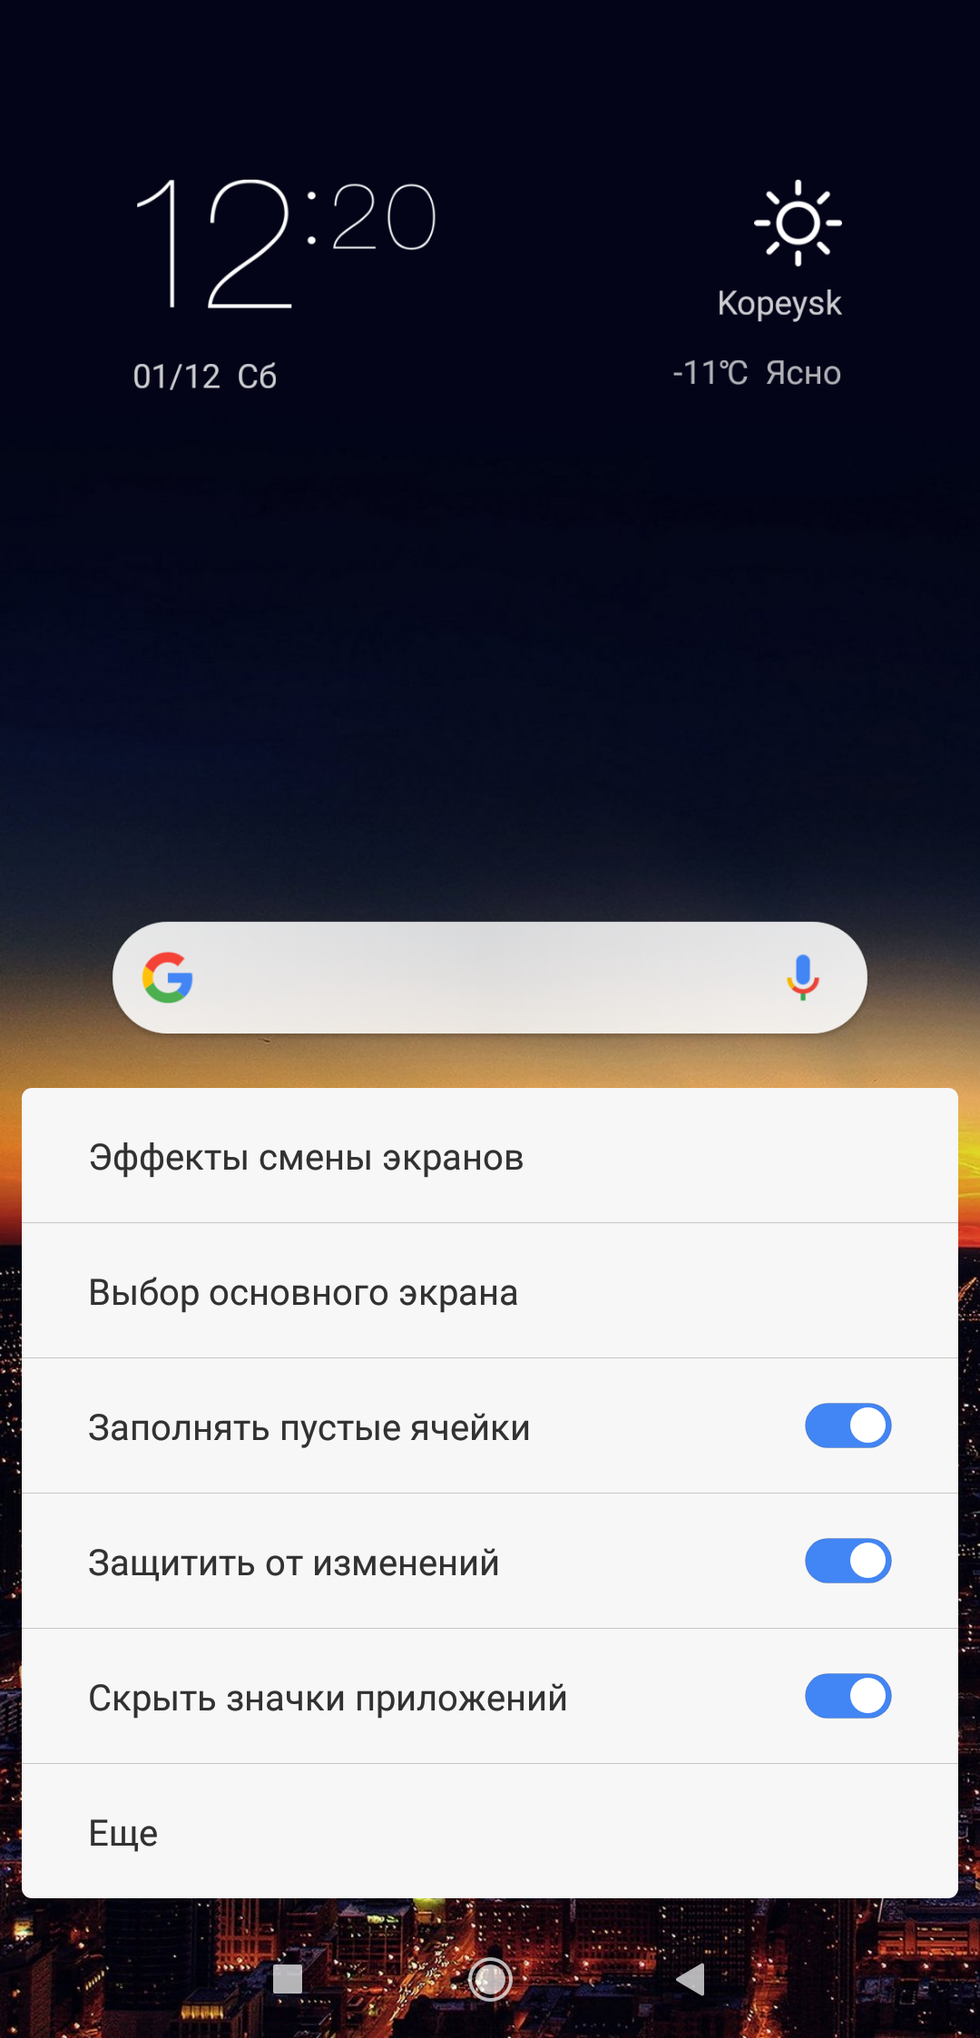 Screenshot_2019-01-12-12-20-58-581_com.mi.android.globallauncher.png